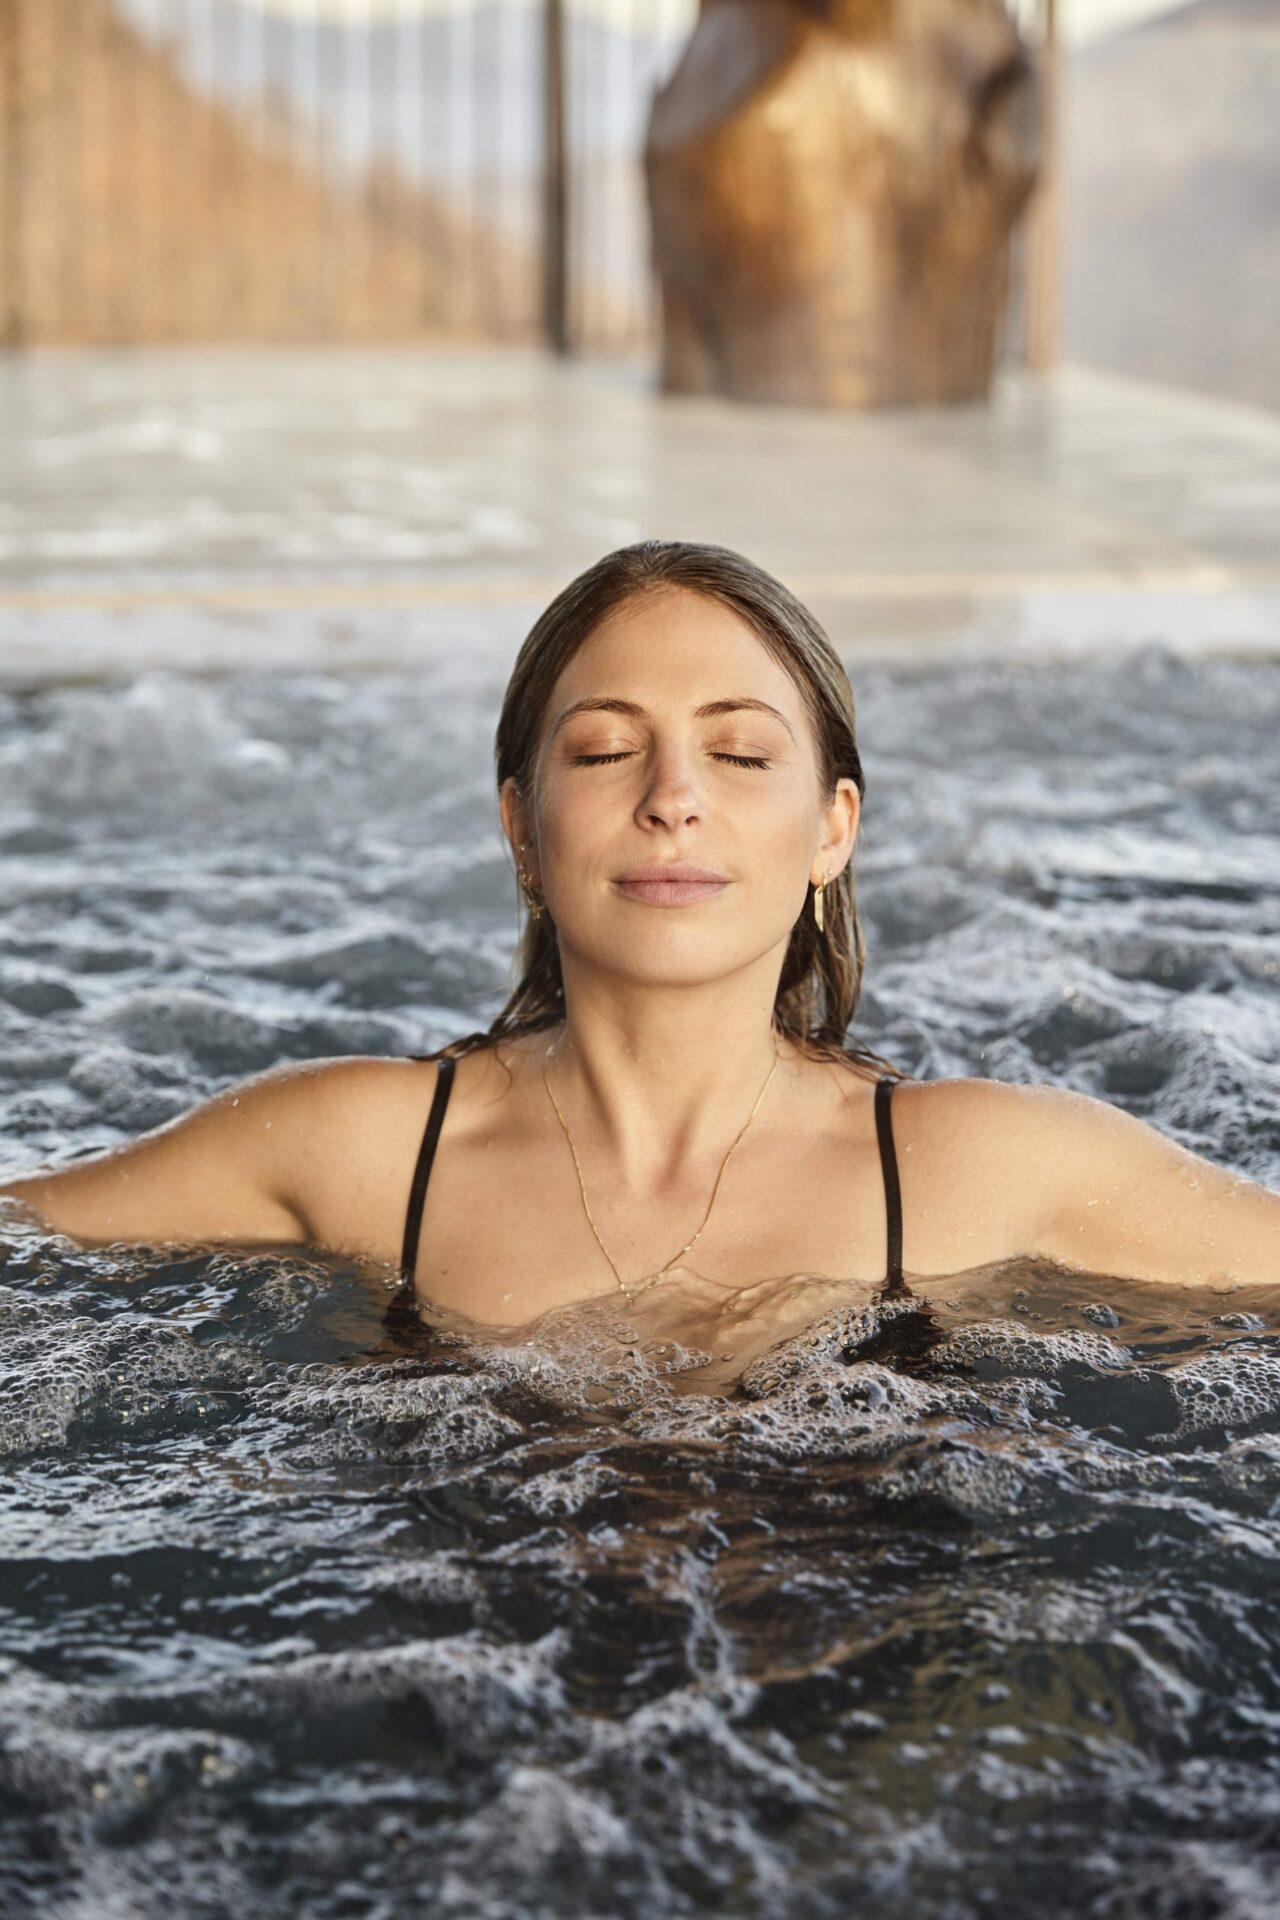 Mandali 1542 e1548918060602 scaled Sarah Chronis op yogareis in Italië: 'Elke dag word ik rustiger'